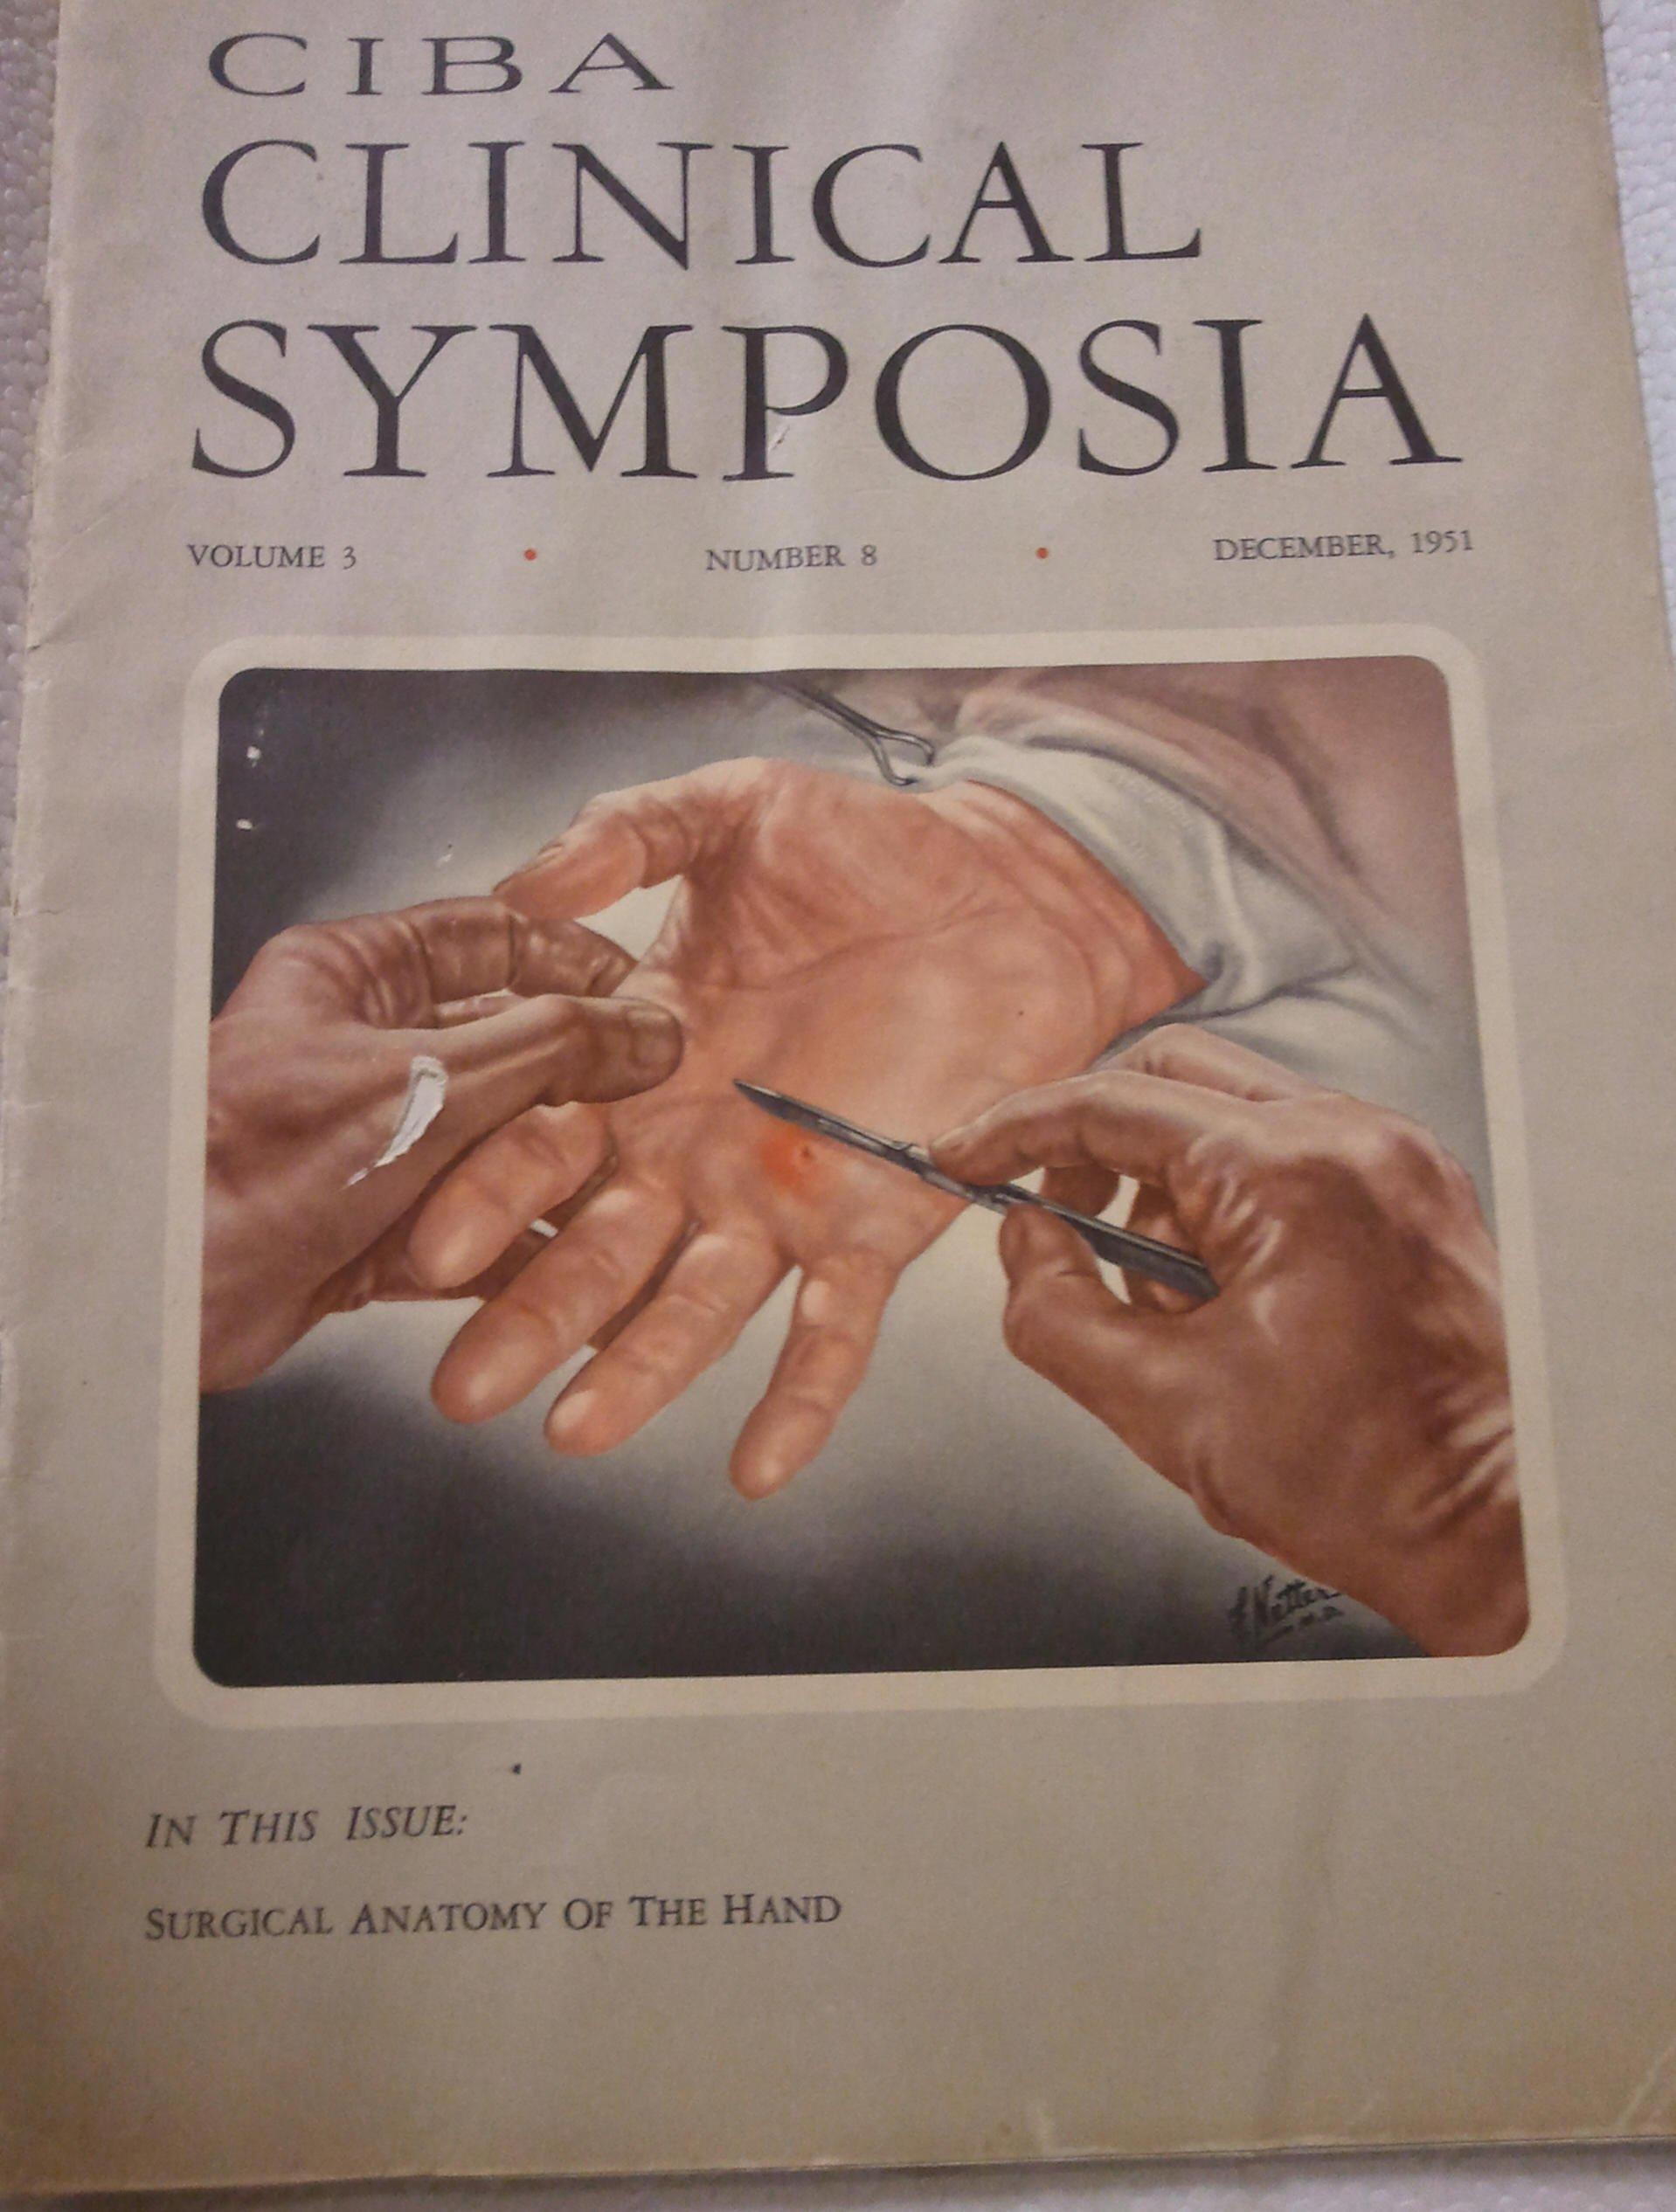 Ciba Clinical Symposia Volume 3 Number 8 \